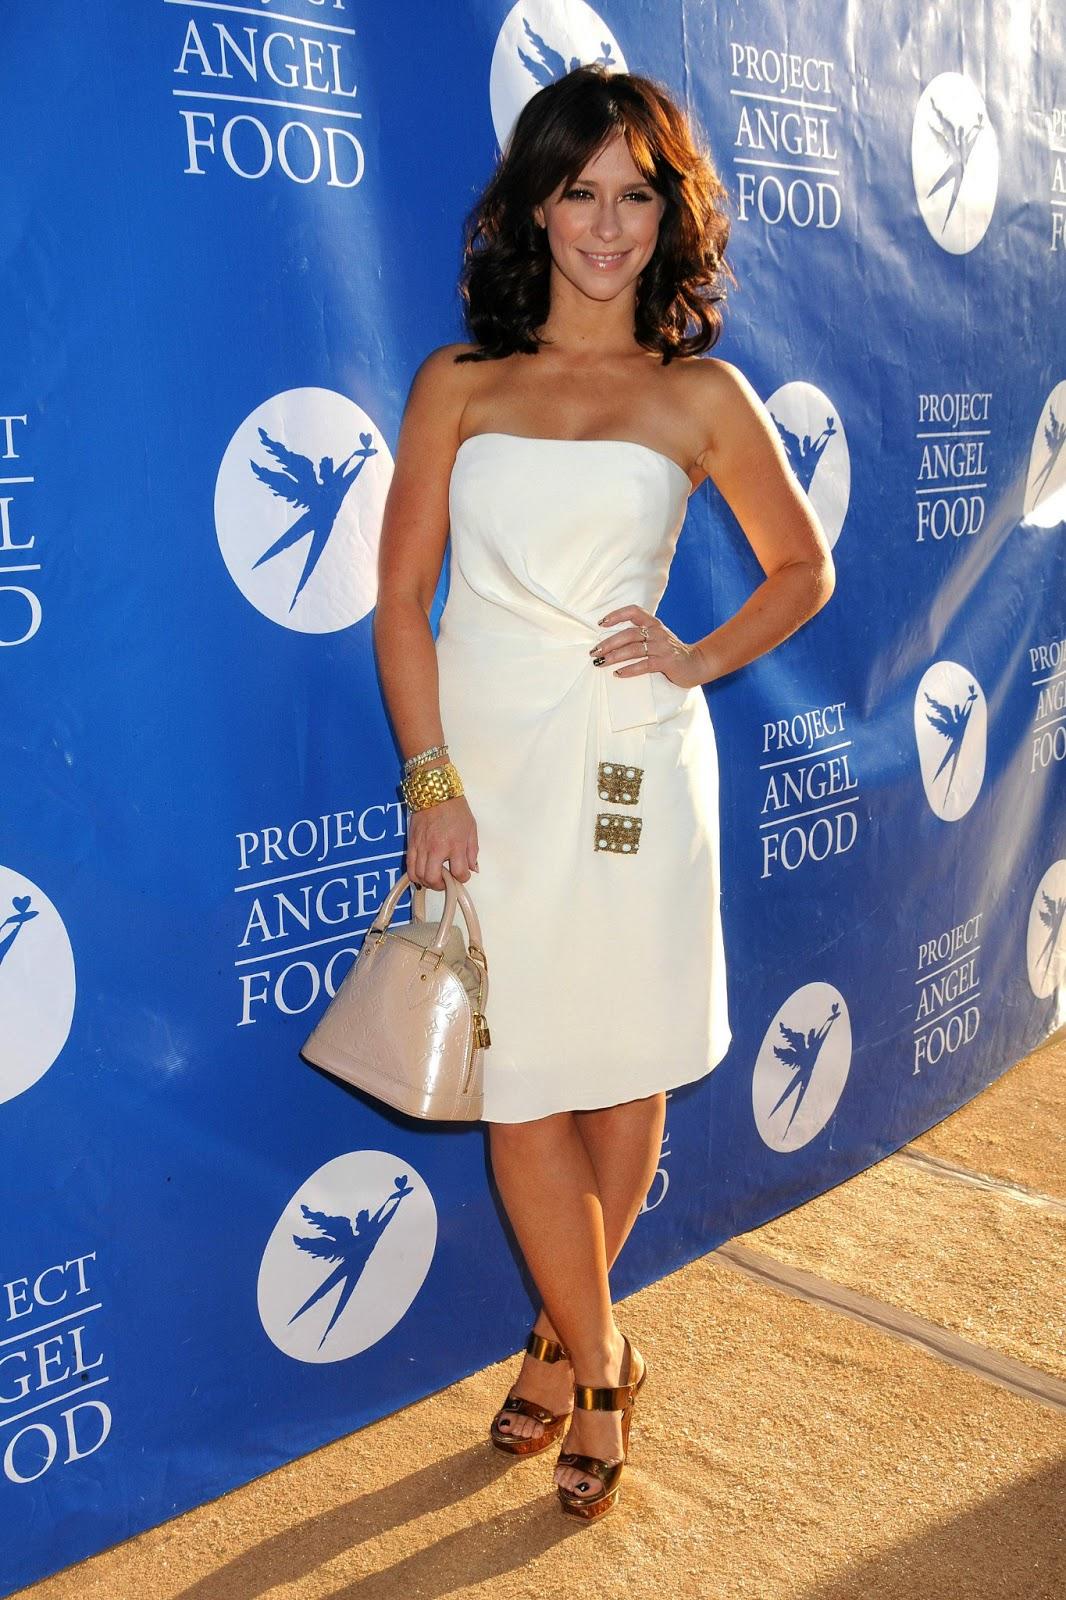 Jennifer Love Hewitt | Celebrity Shoes Gallery Anna Paquin